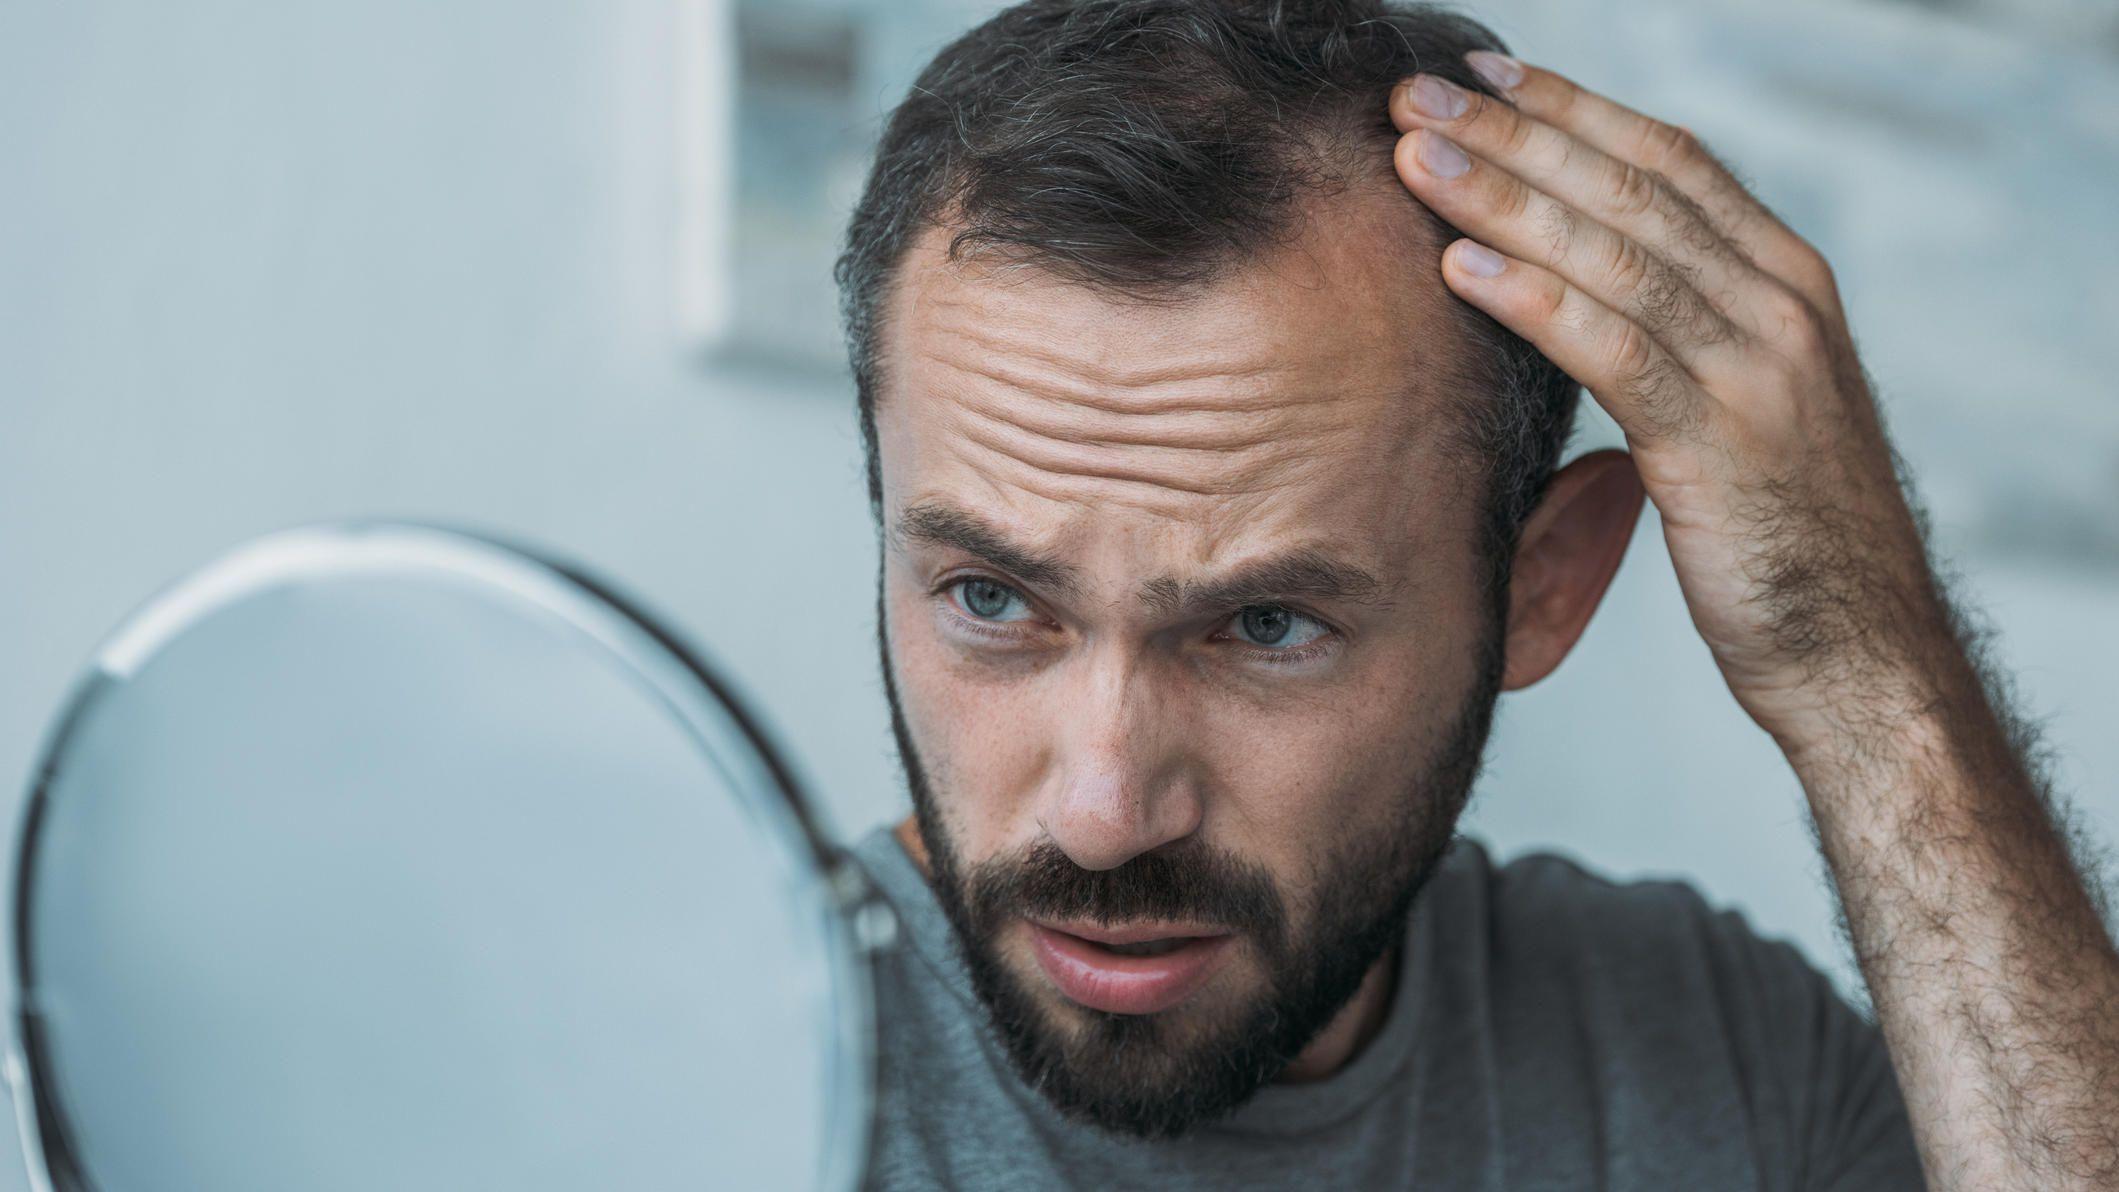 Mit 20 glatze Glatze mit